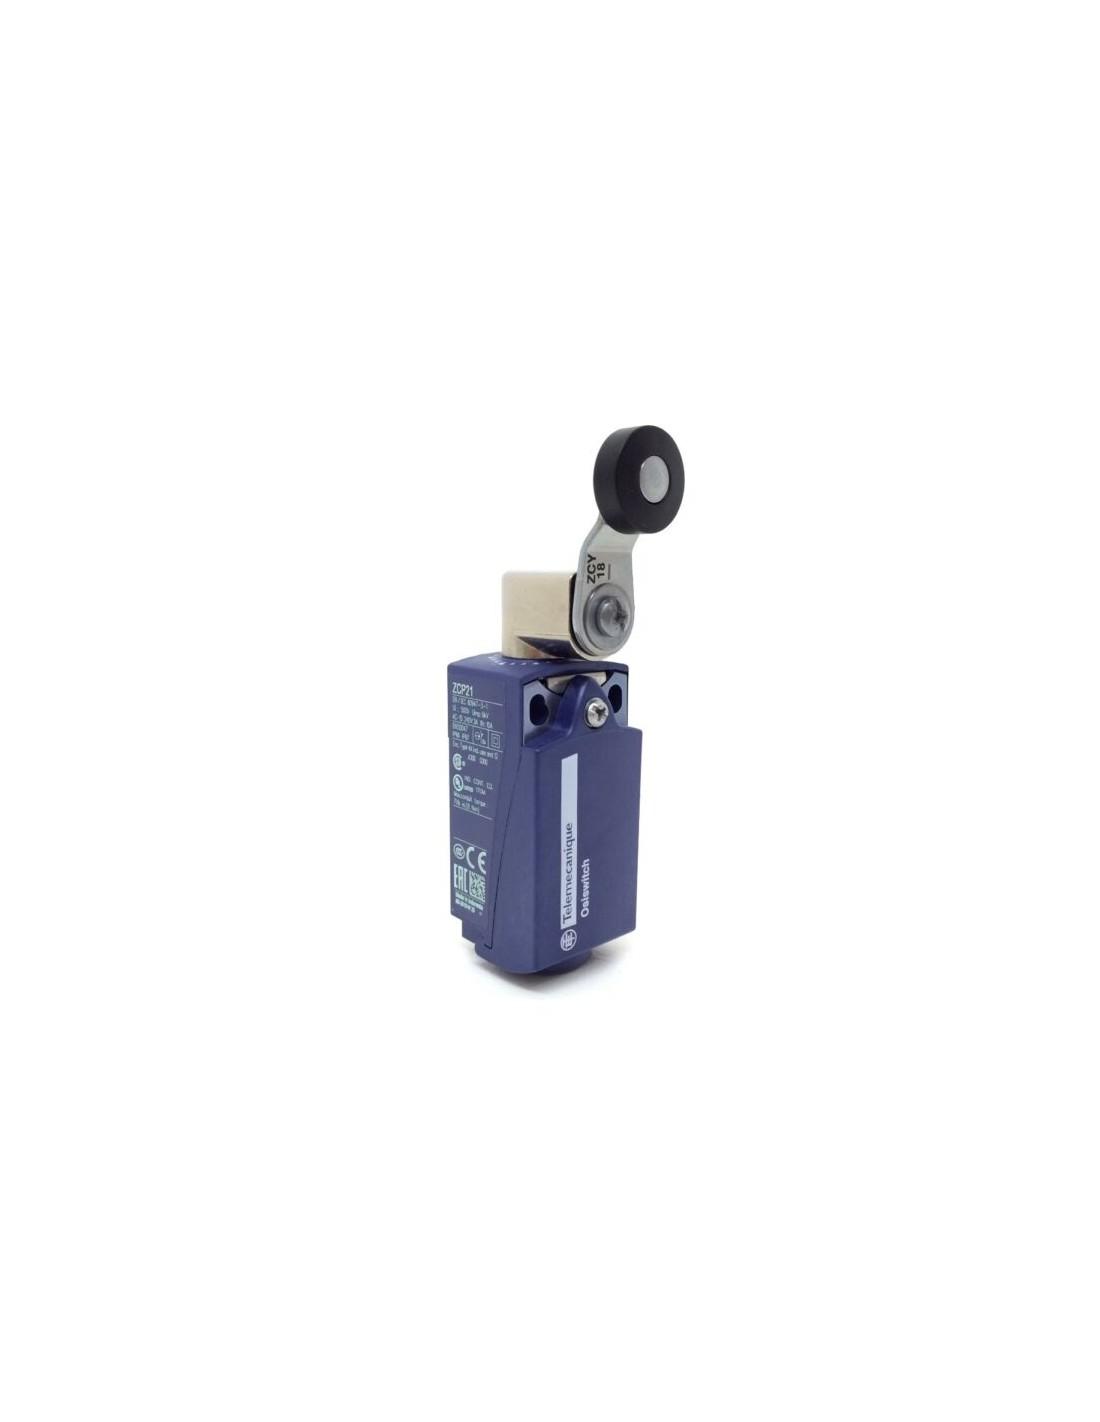 Gewiss gw66031 5 pole iec 309 interlock switch outlet box sales price gewiss gw66031 asfbconference2016 Gallery